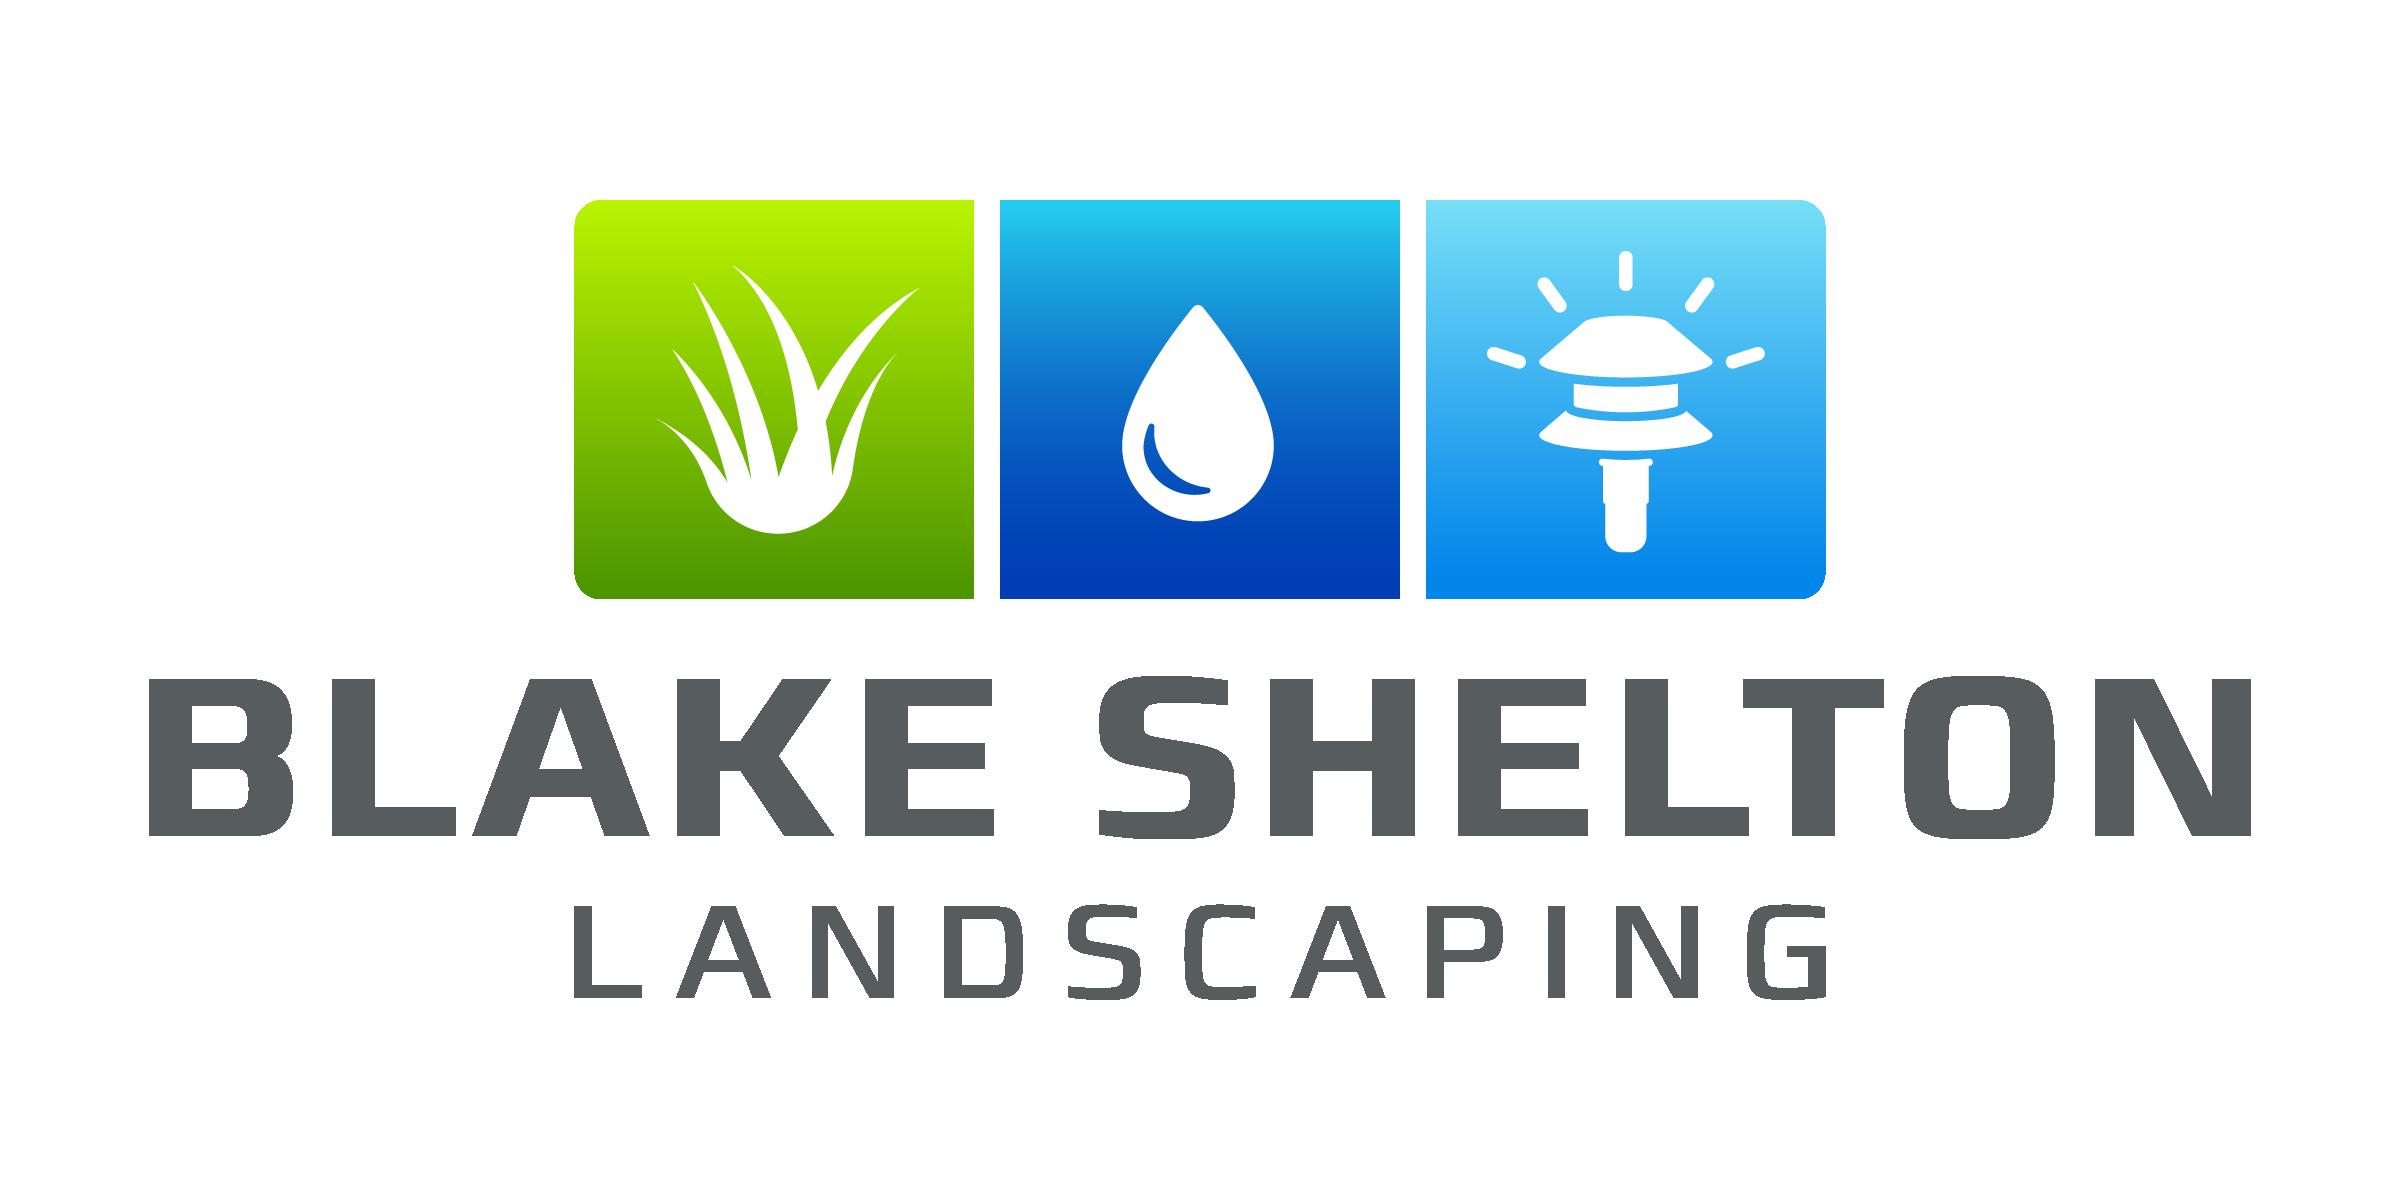 Blake Shelton Landscape